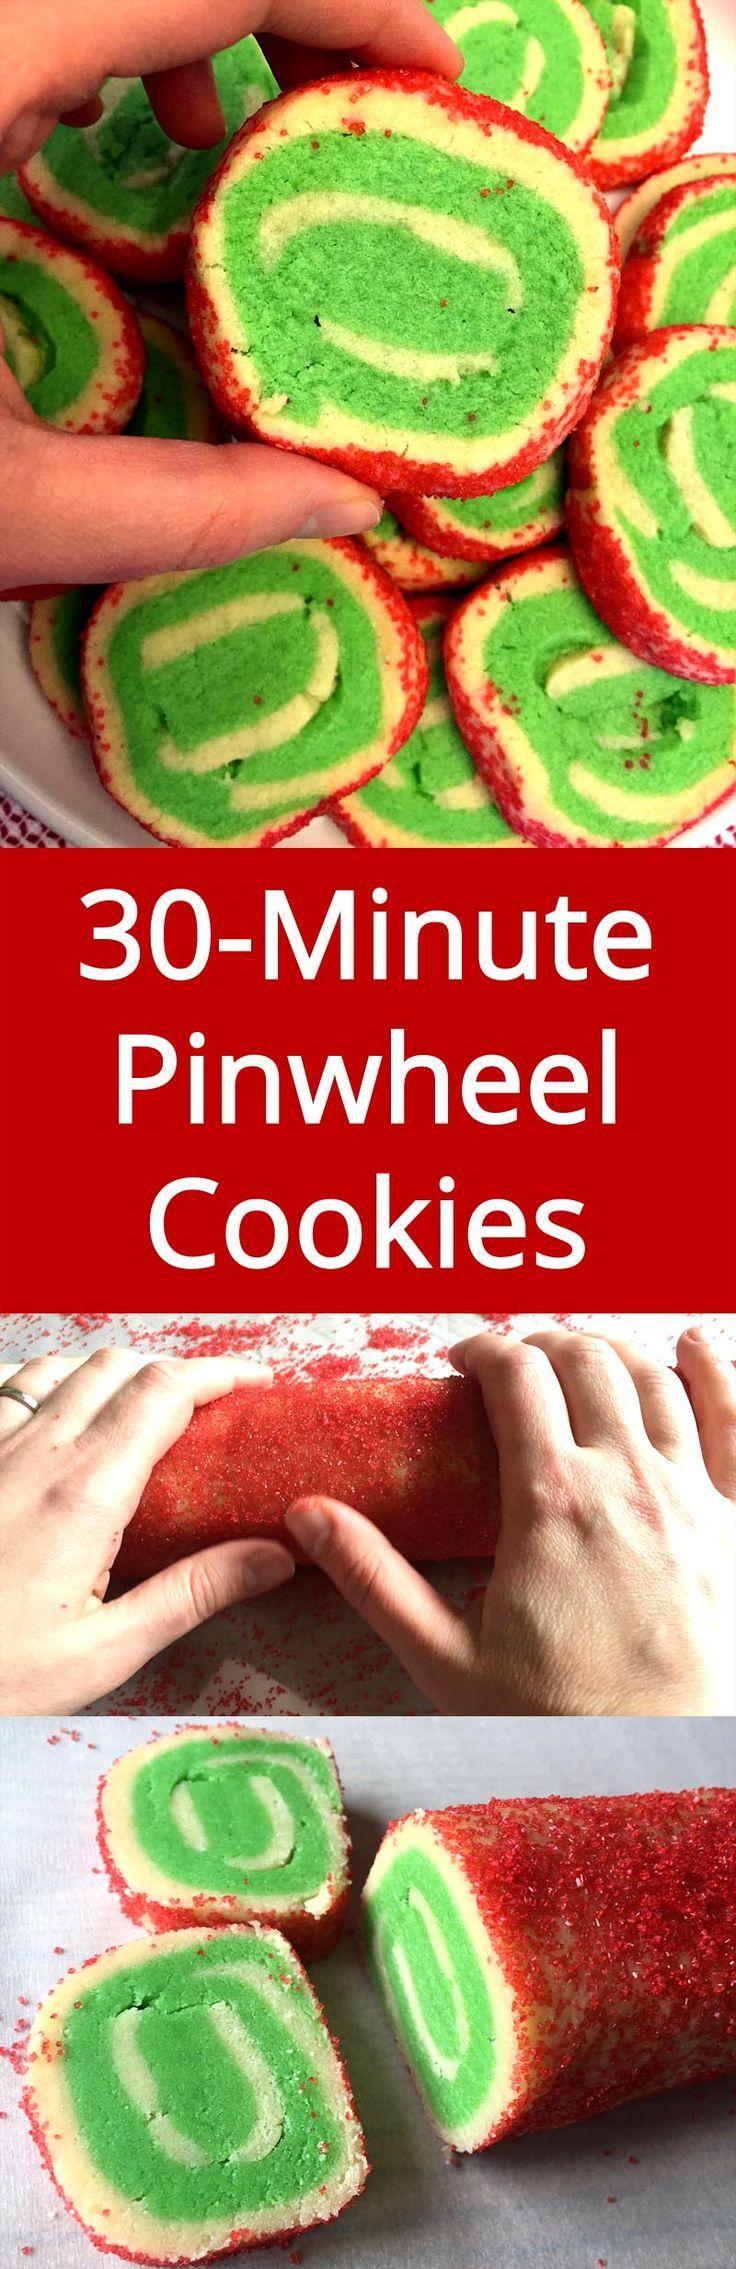 No need to chill the dough! I'm trying this ASAP! Love pinwheel sugar cookies!| http://MelanieCooks.com